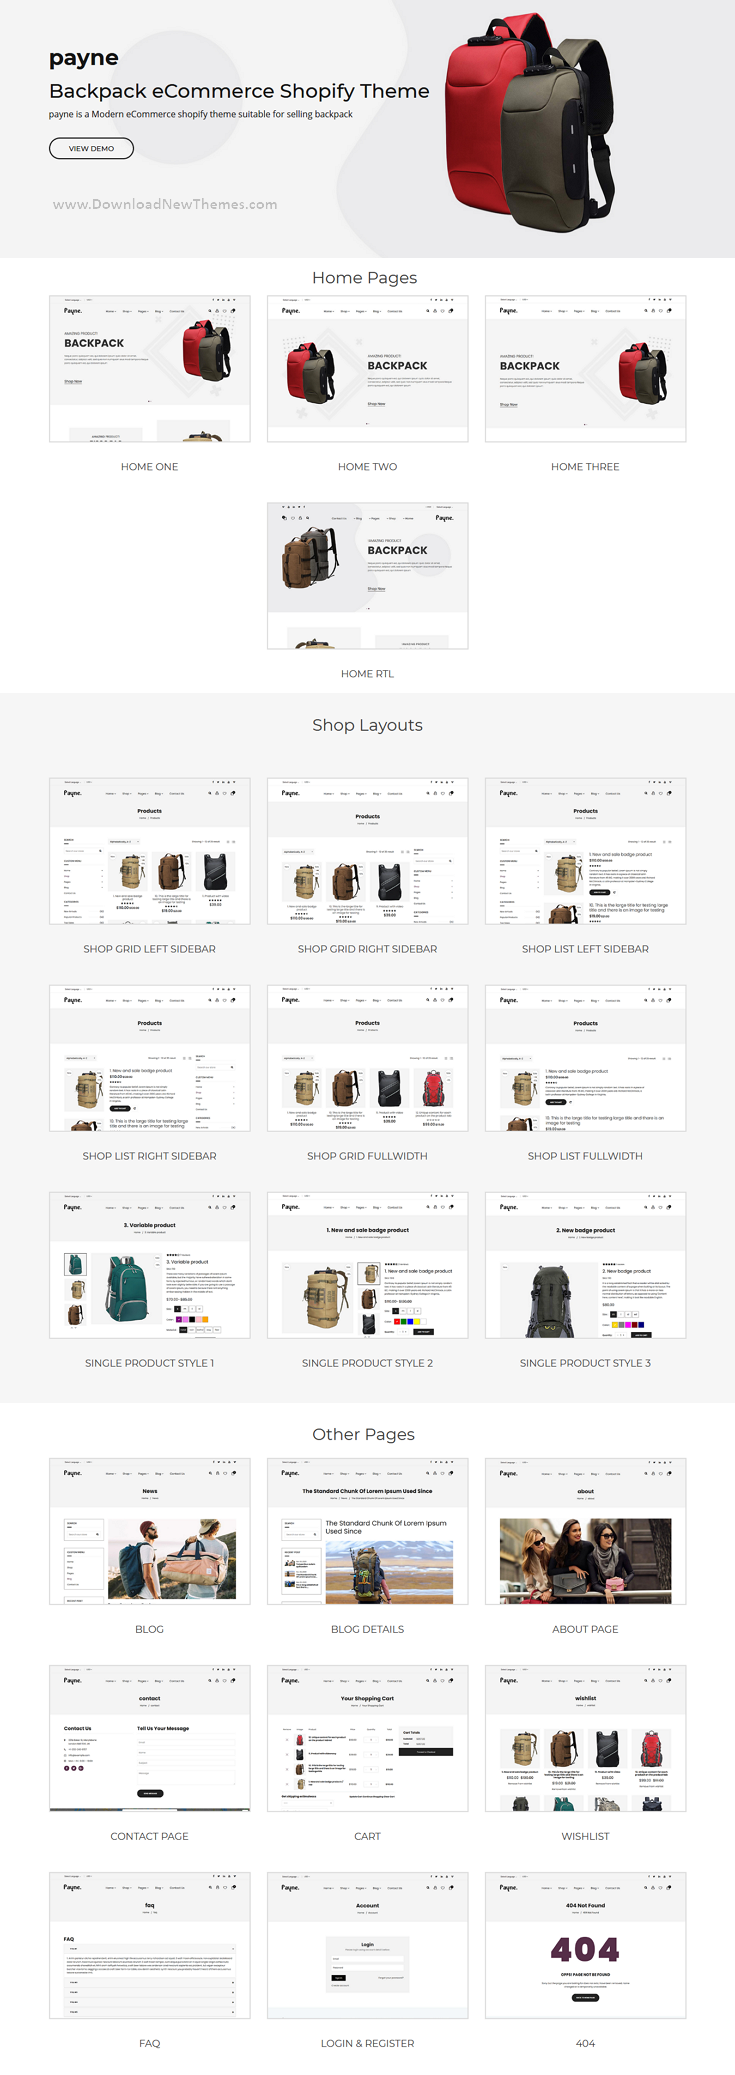 Backpack eCommerce Shopify Theme